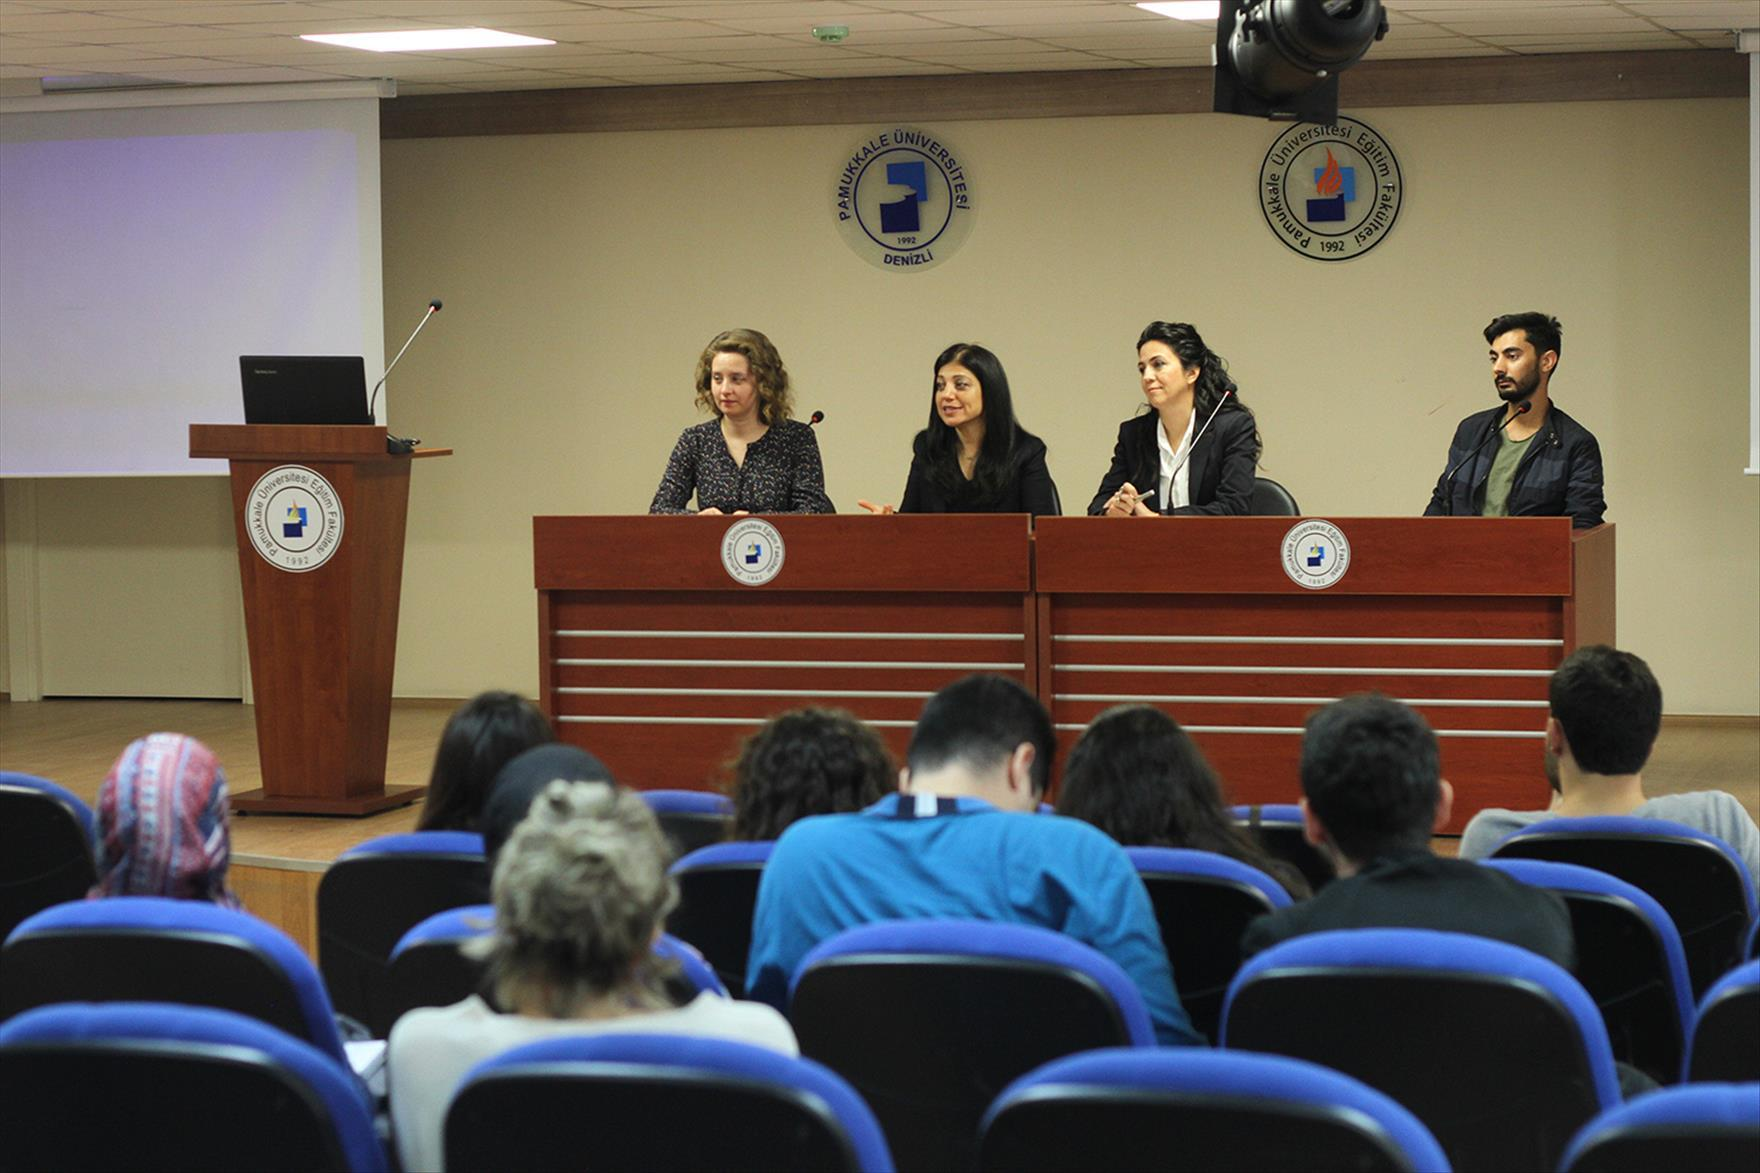 Erasmus traineeship information sessions at pau start